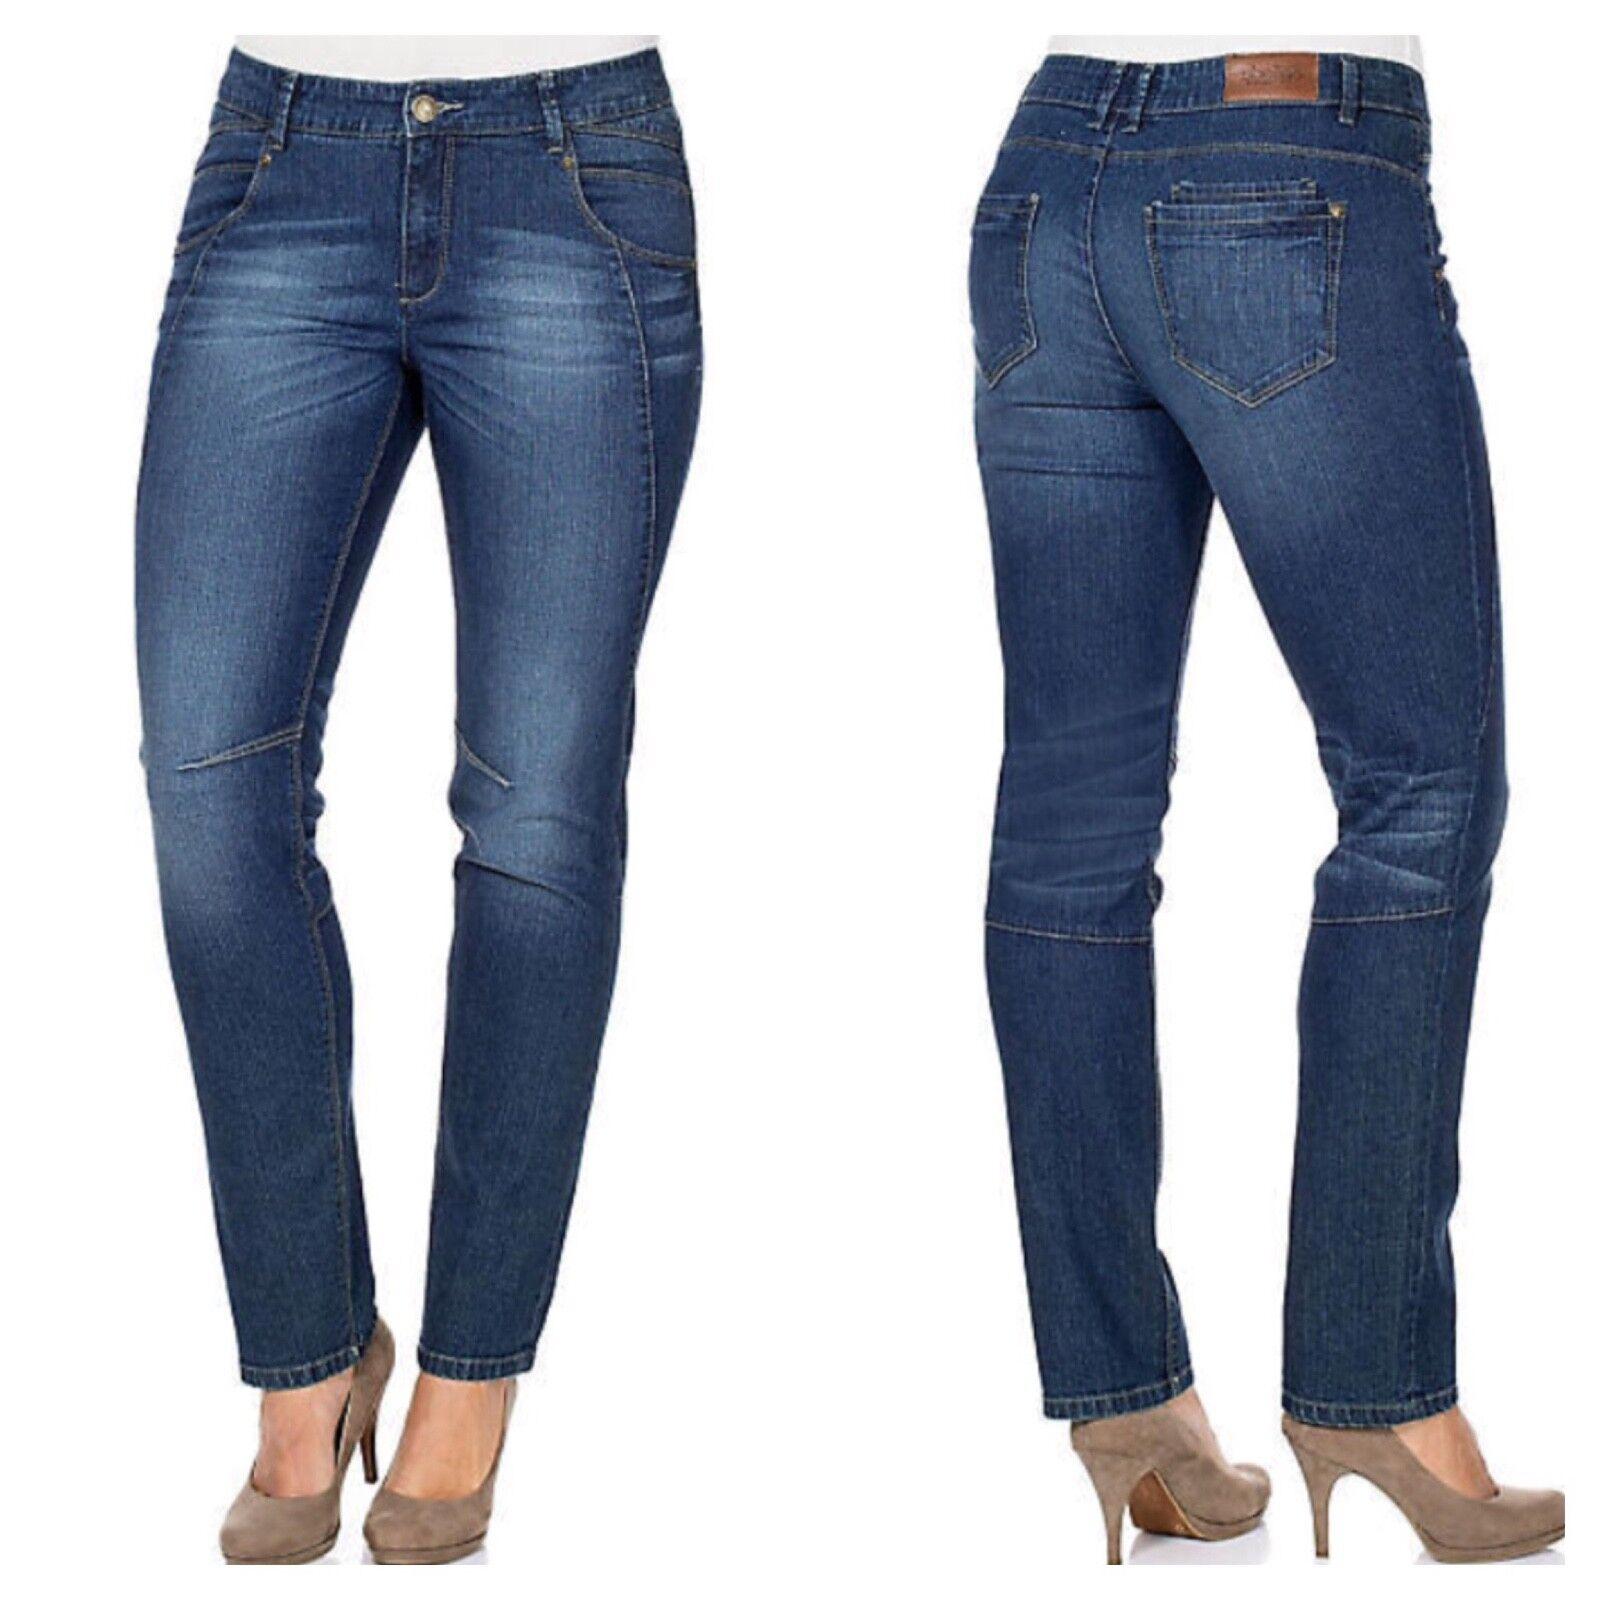 Sheego @ Kaleidoscope Plus Size 30 Straight Leg Kira Dark bluee Denim JEANS